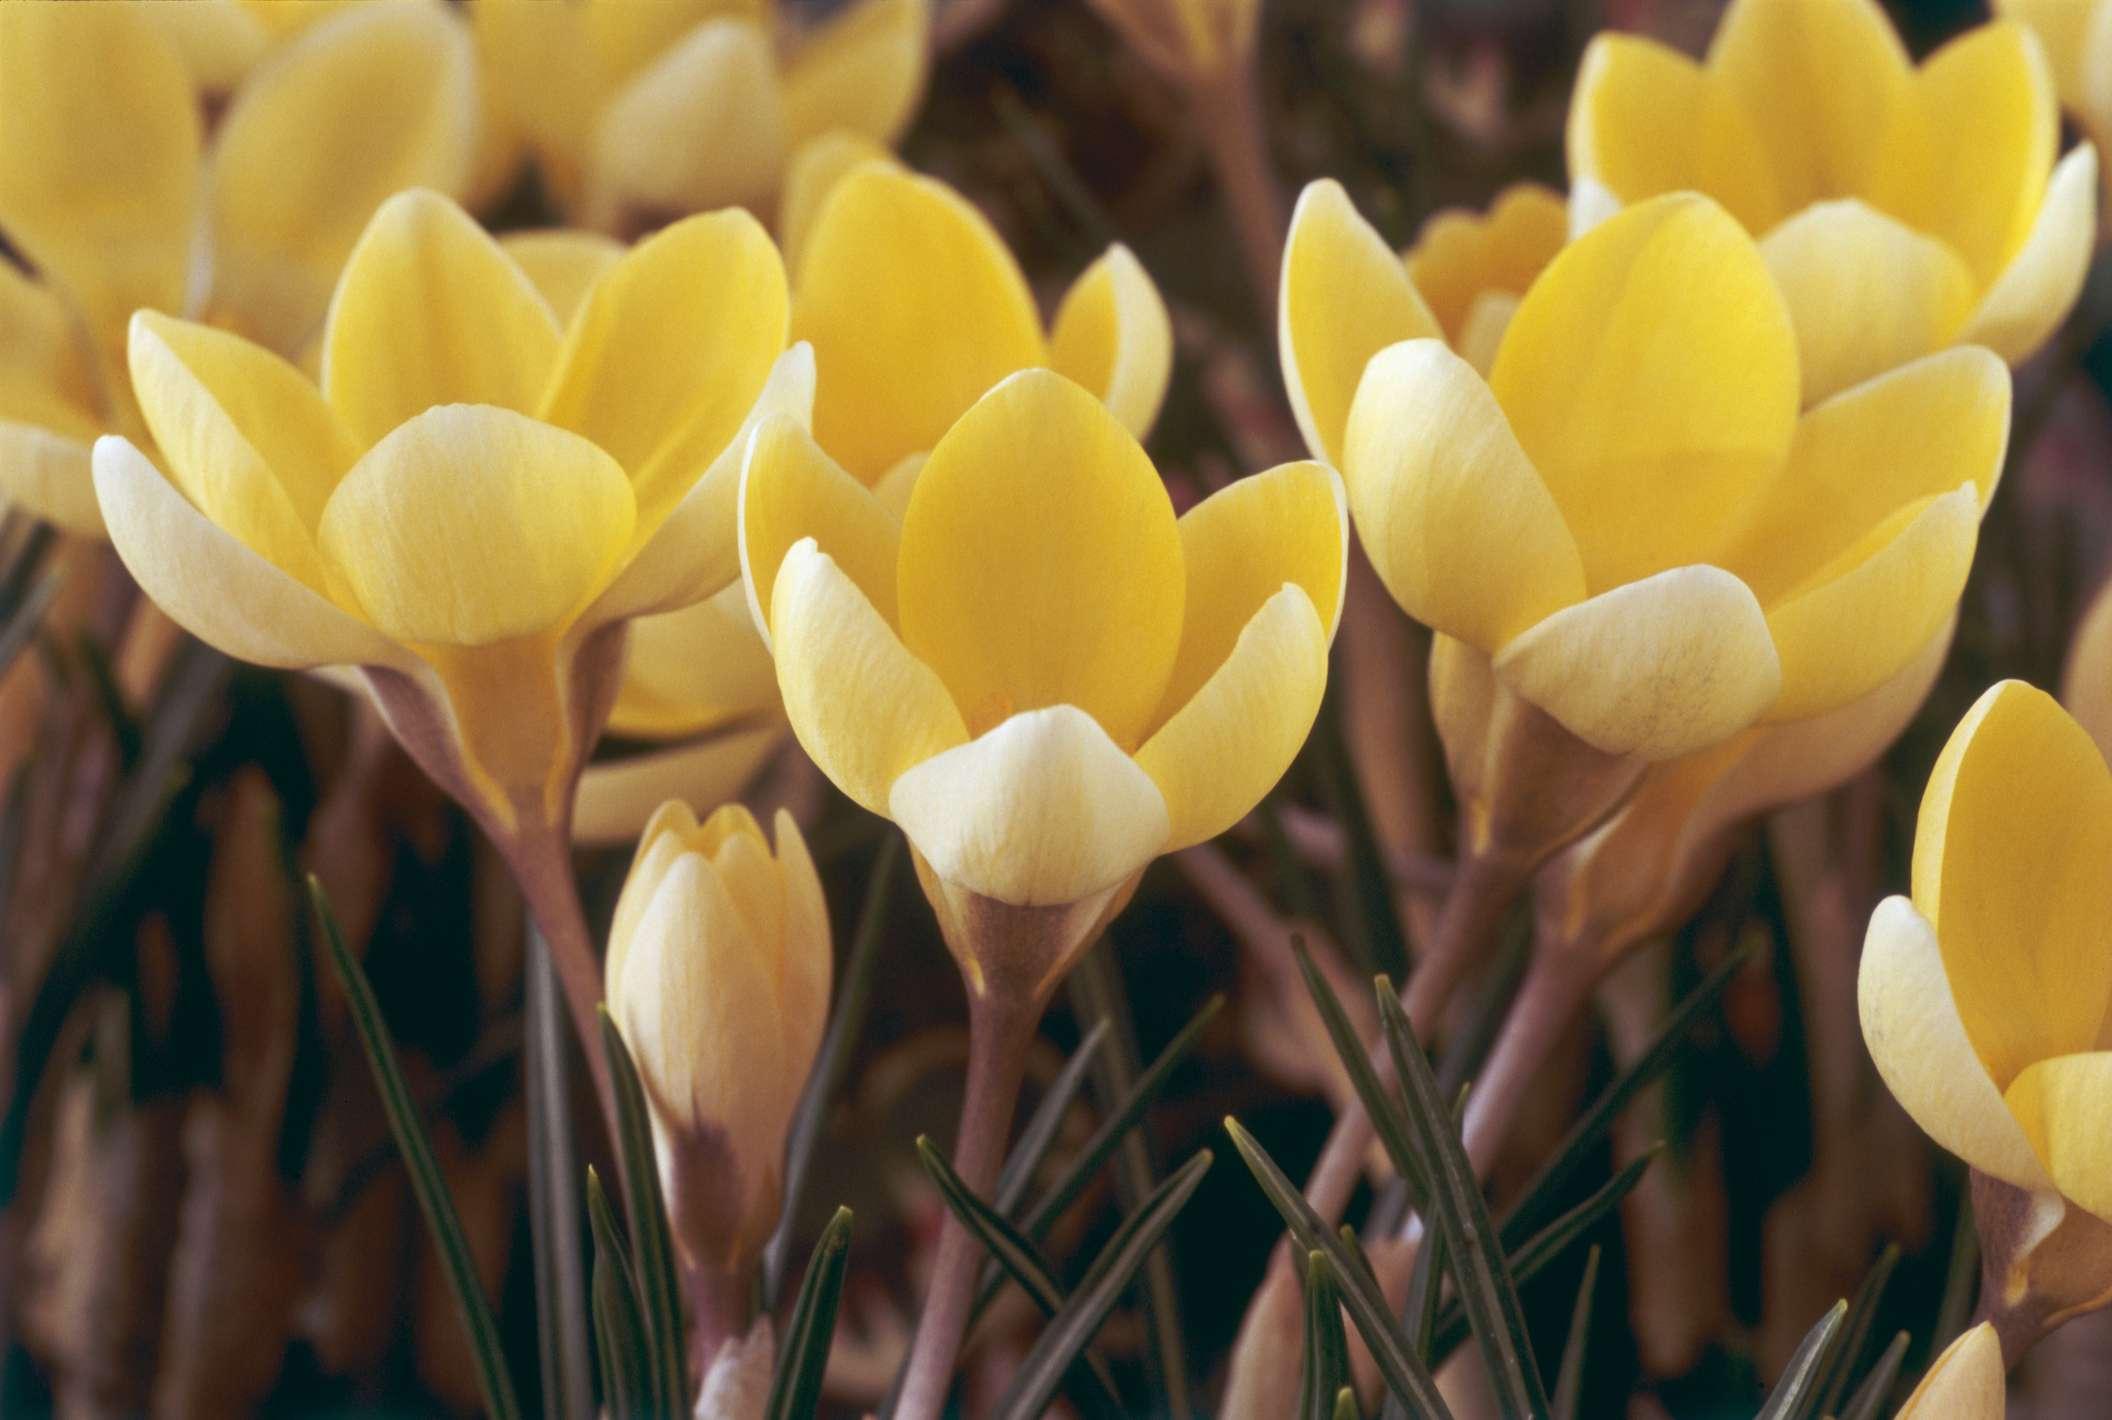 'Romance' crocus with yellow petals